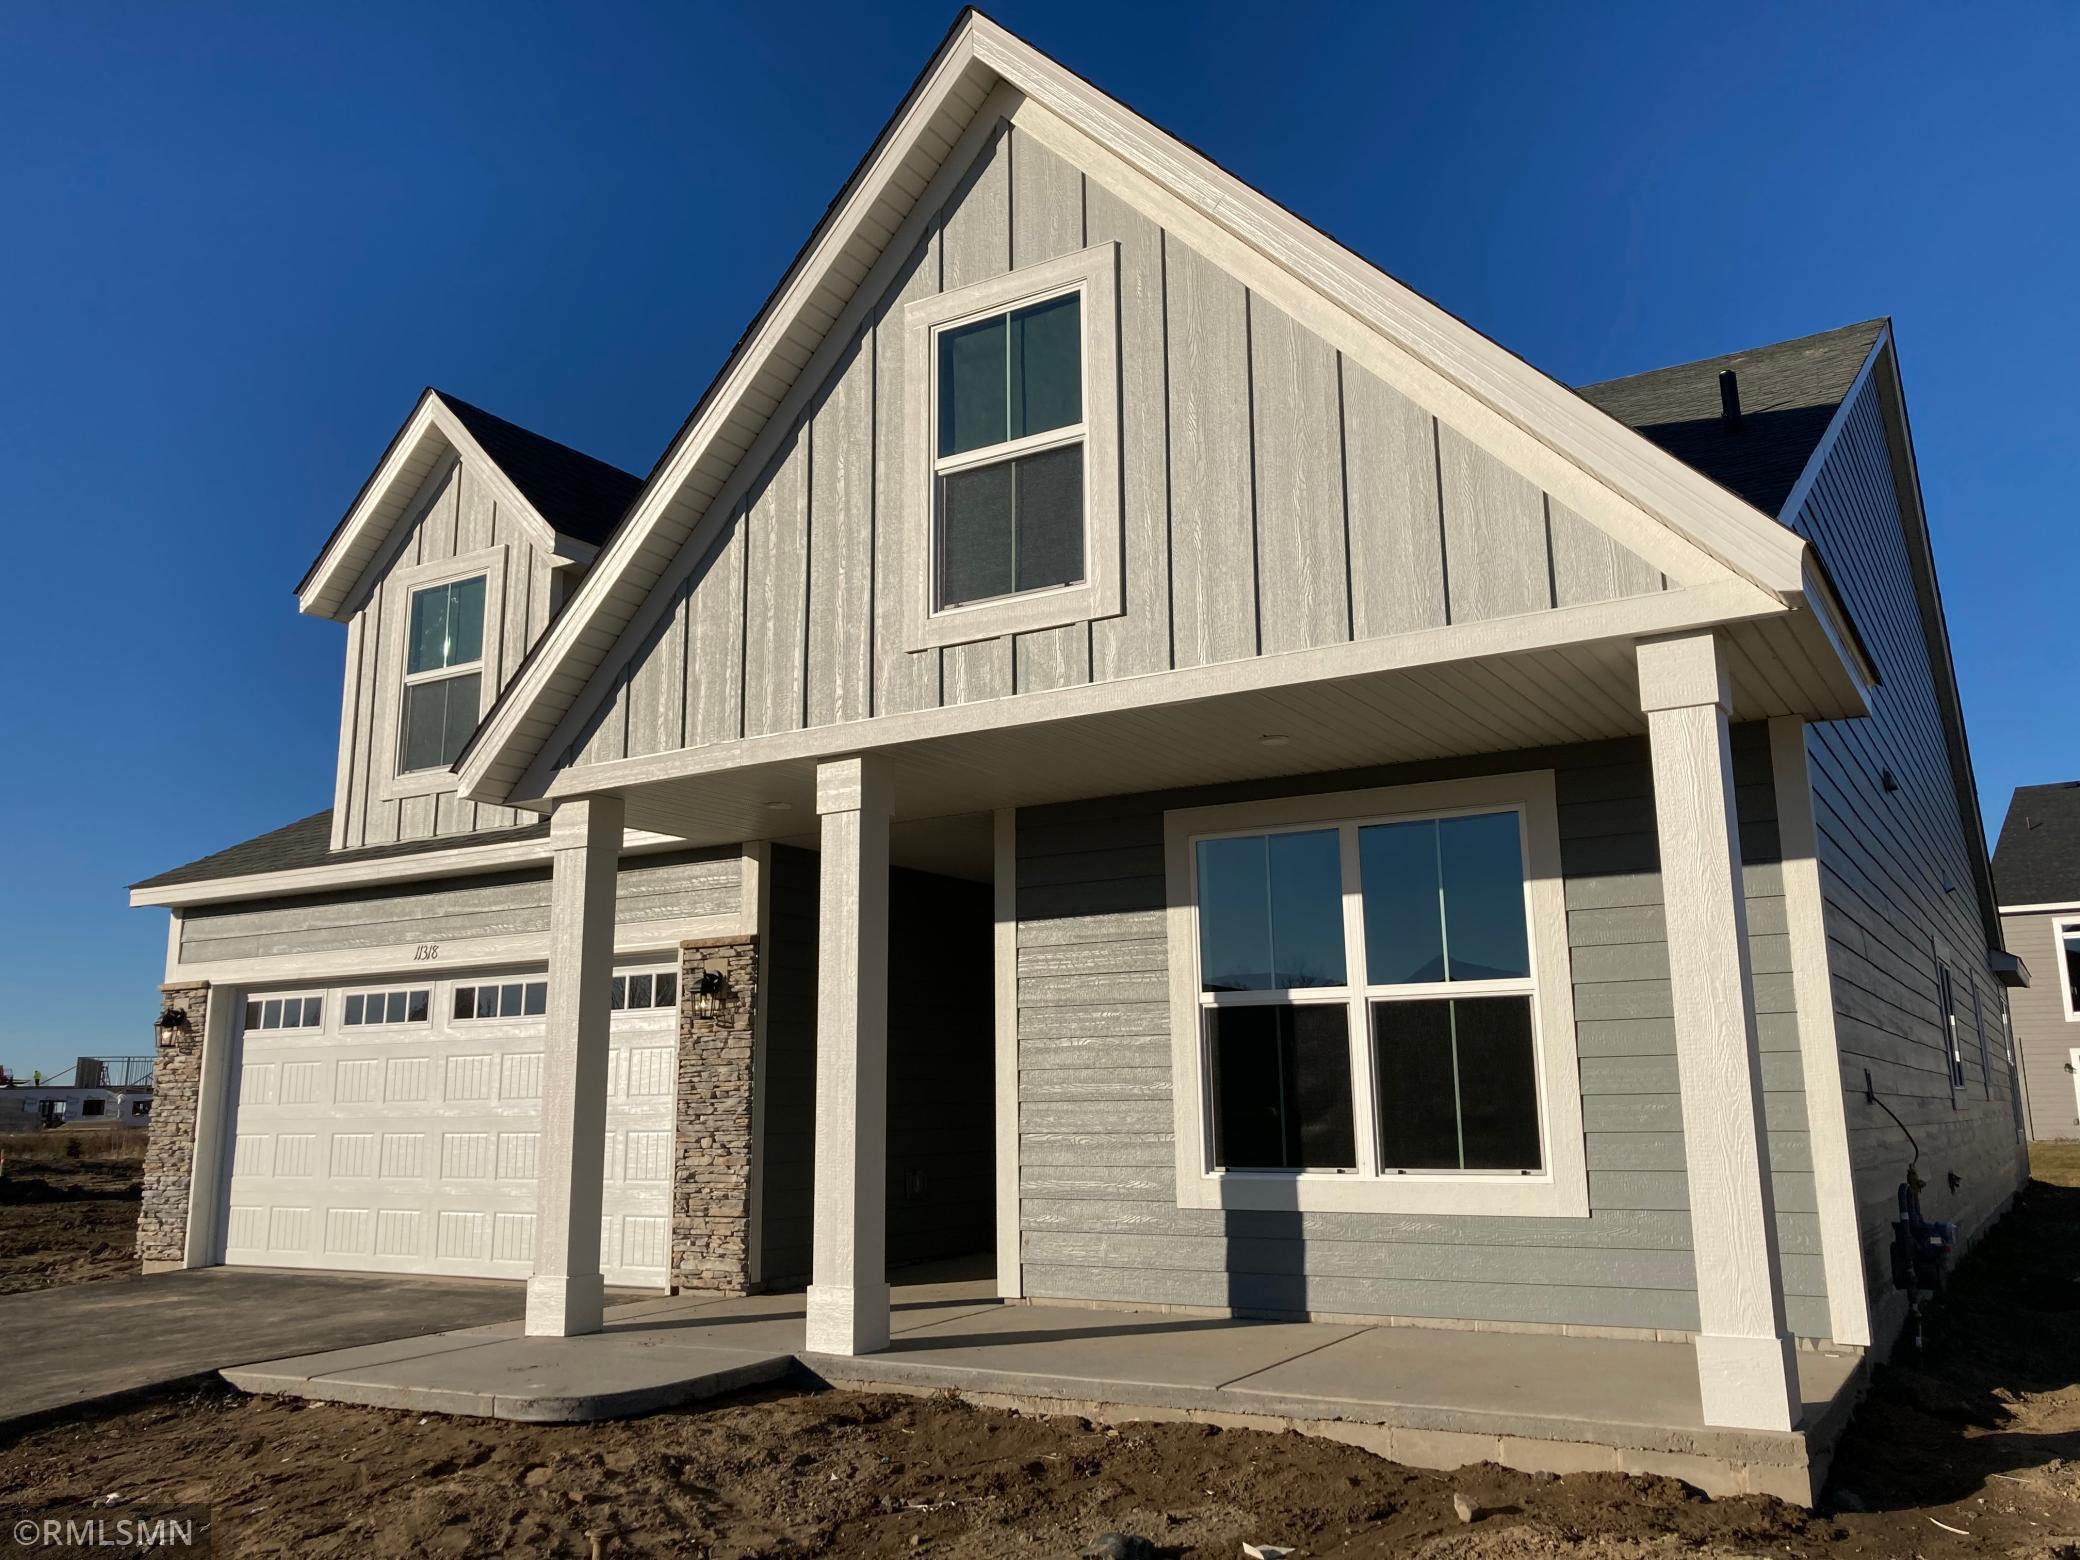 11318 Linden Way Ne, Albertville MN 55301 - Photo 2